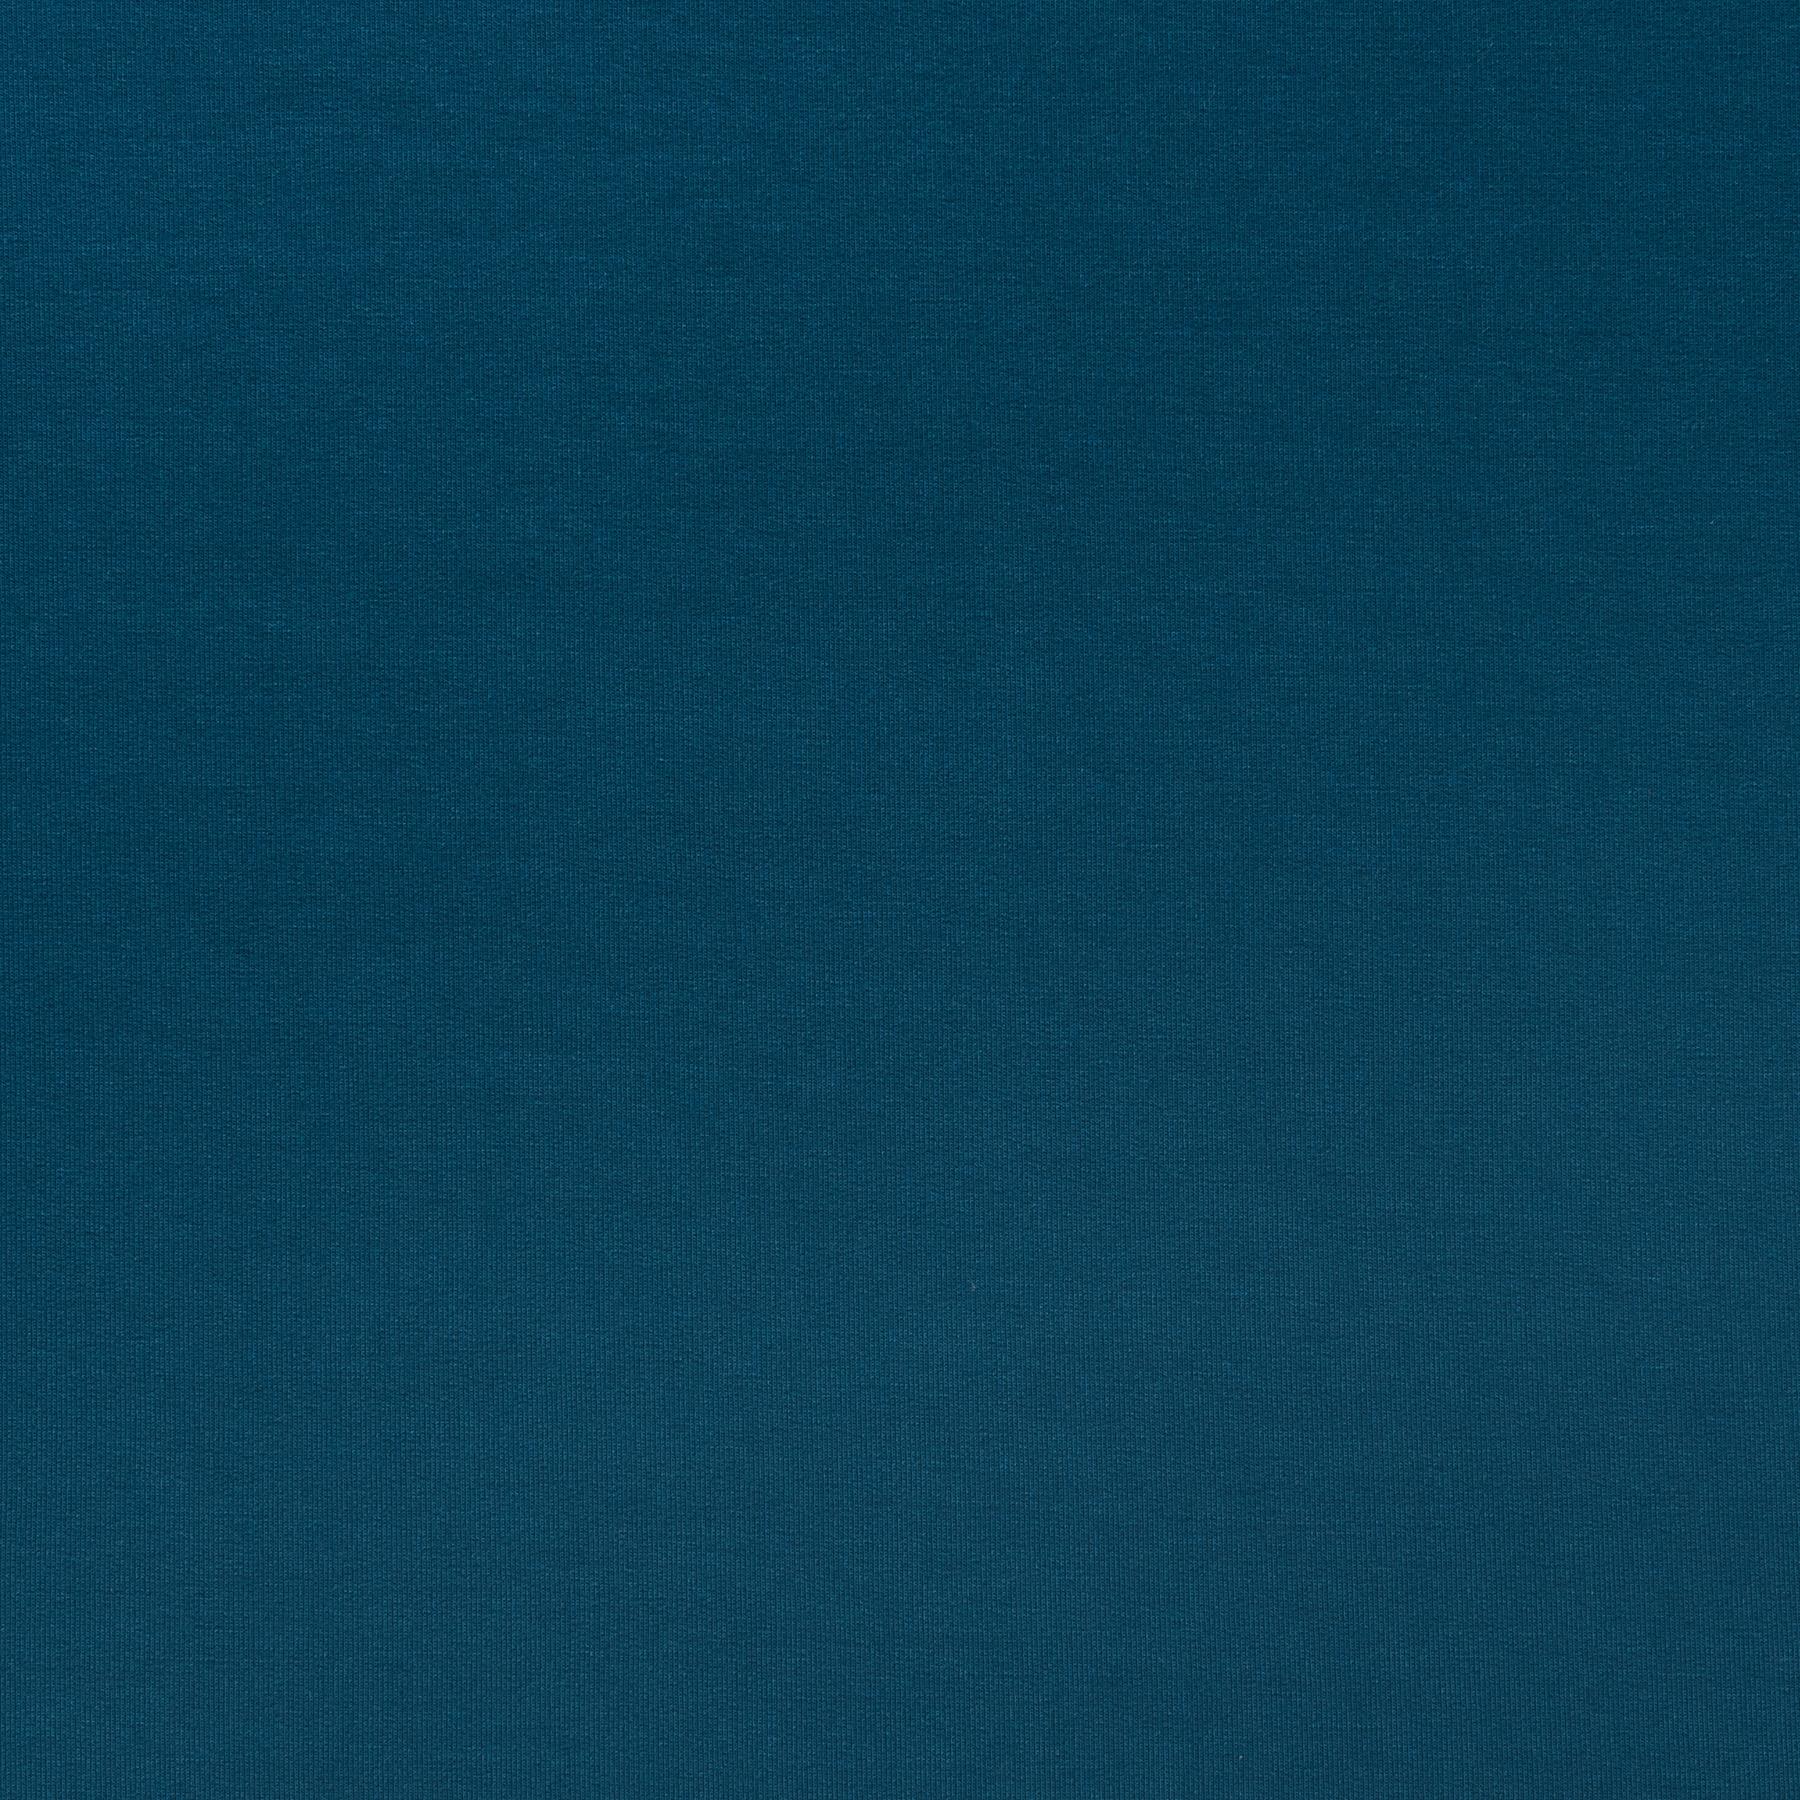 Petrol Blau Wandfarbe: Viskose Jersey Petrol Blau Uni